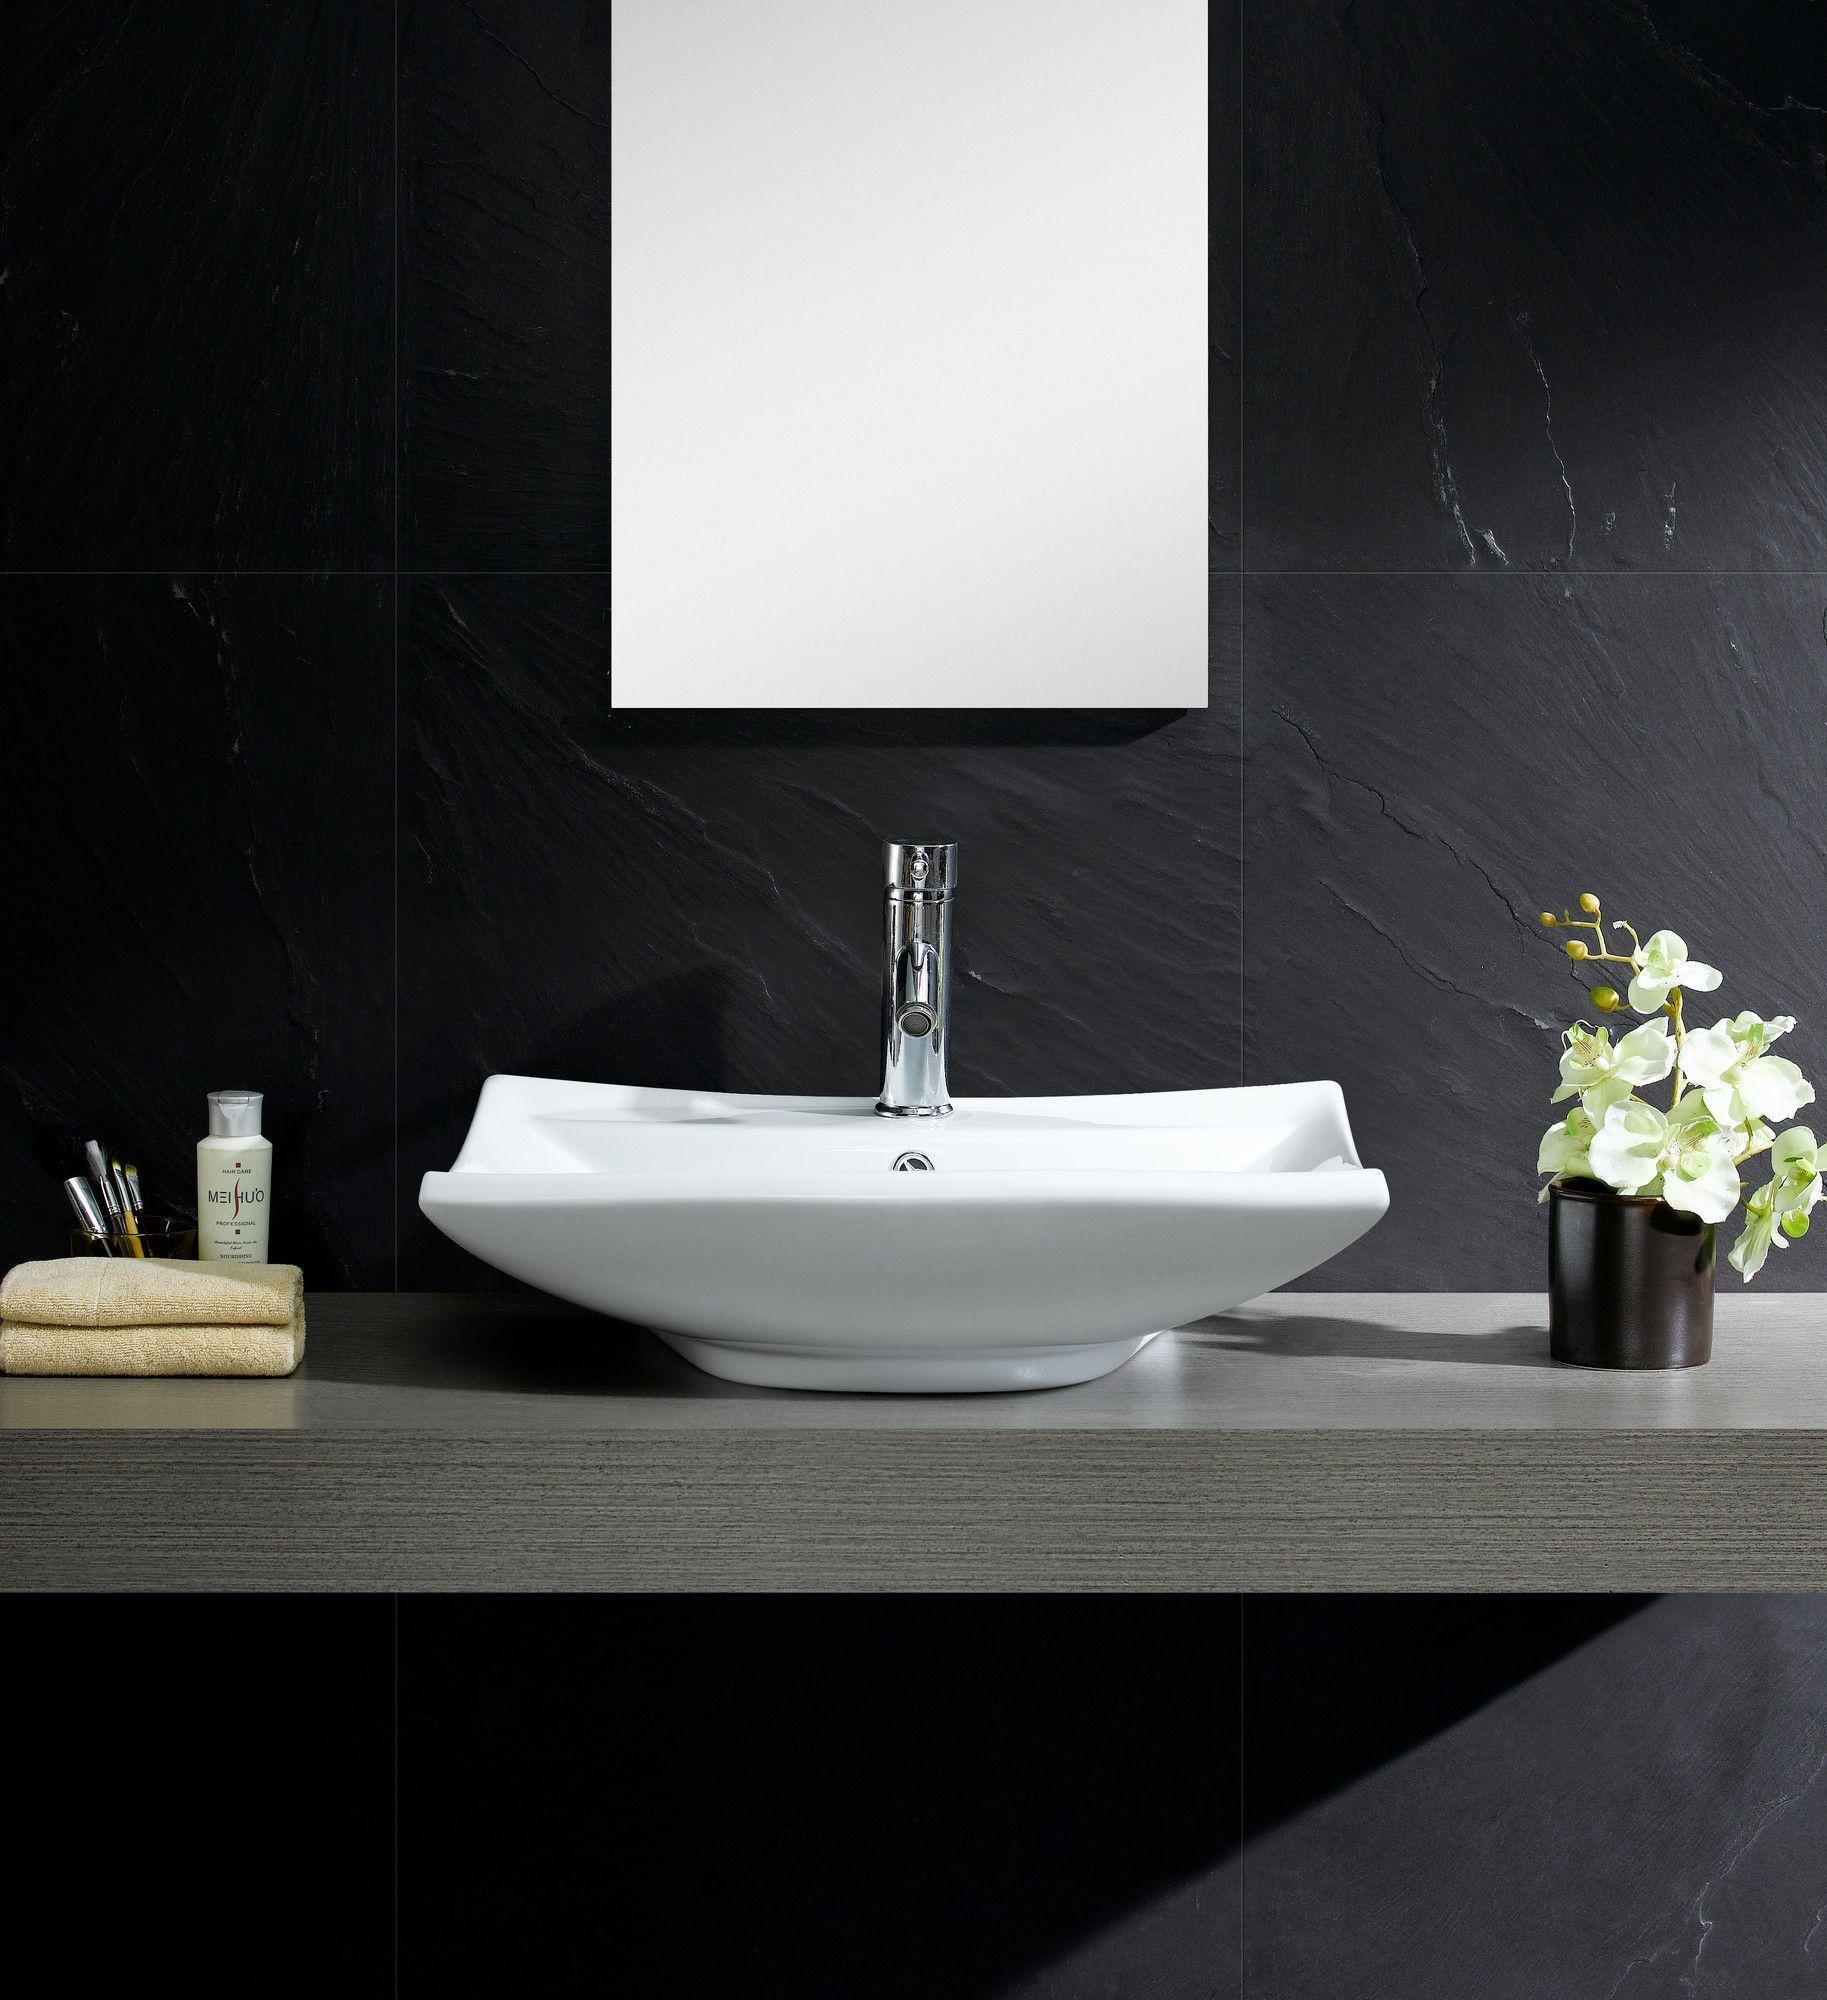 Modern Ceramic Rectangular Vessel Bathroom Sink with